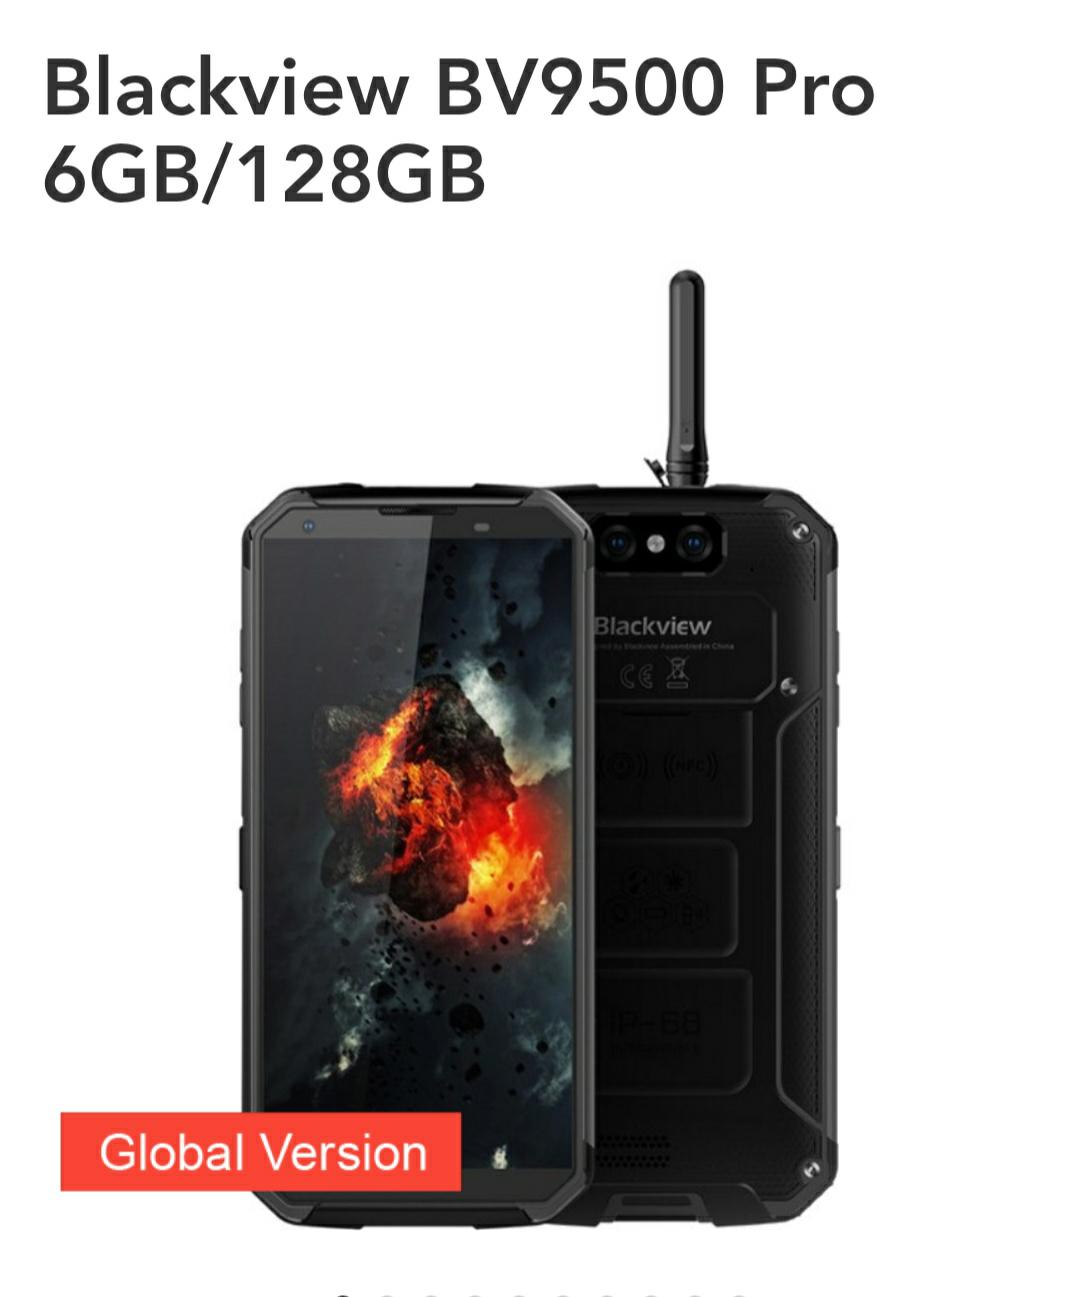 Blackview BV9500 Pro 6GB/128GB